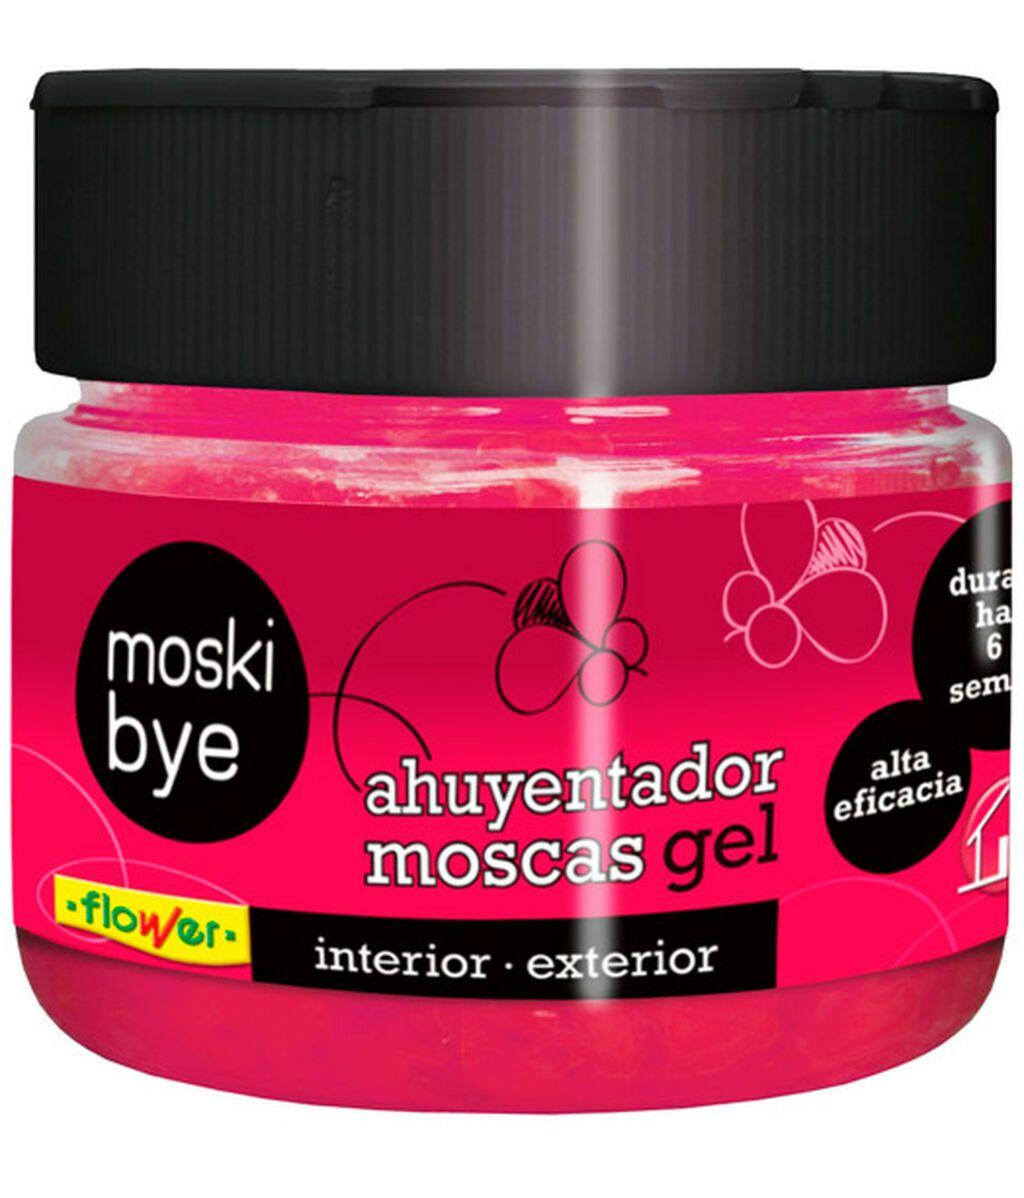 moskibye